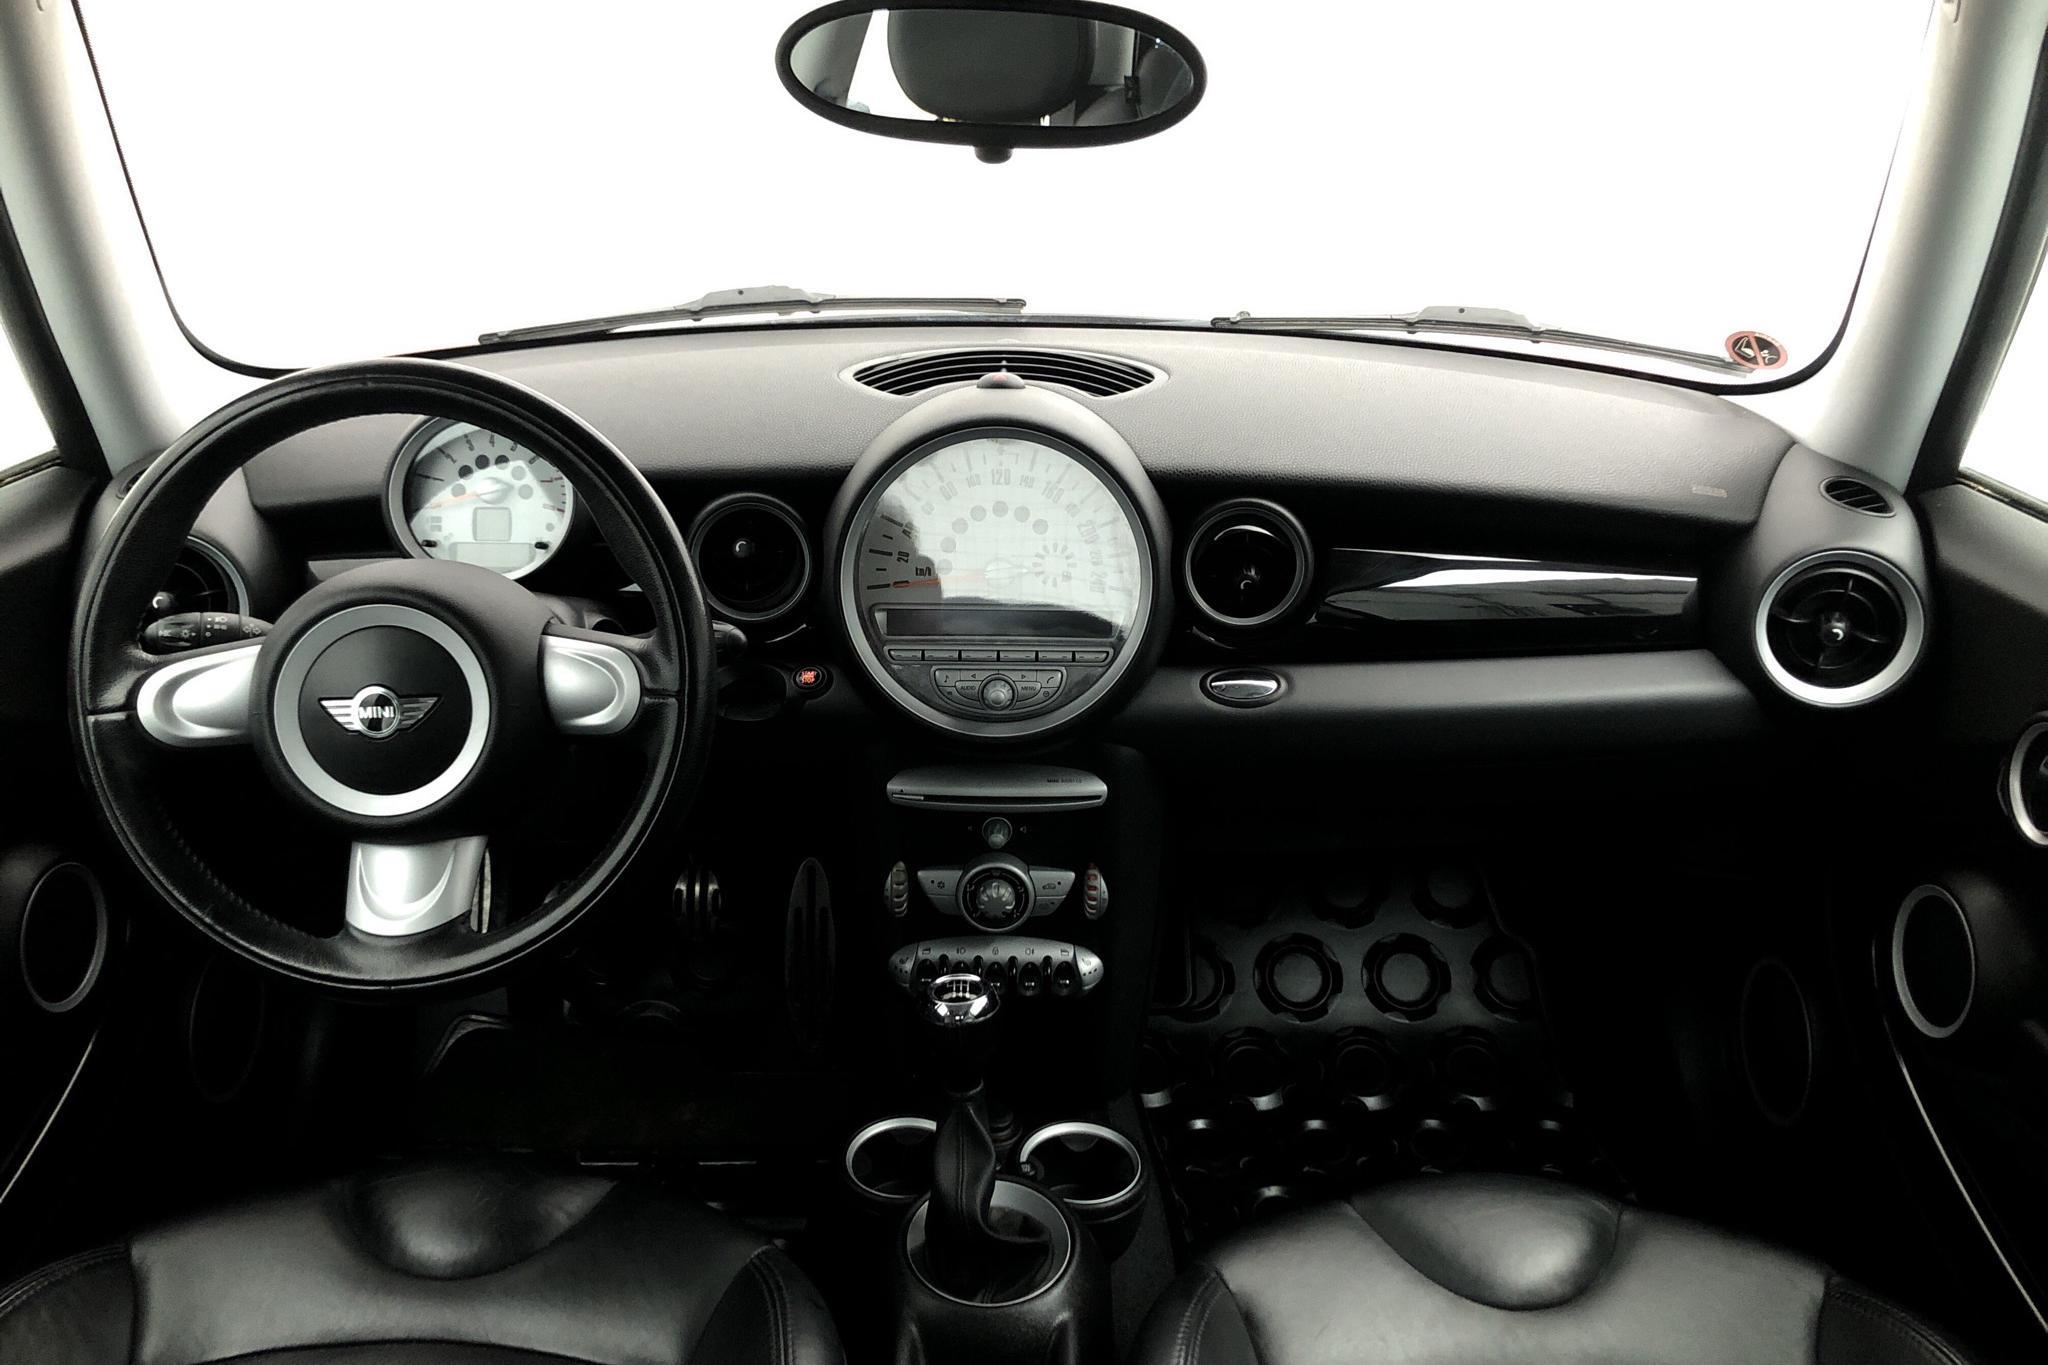 MINI Cooper 1.6 S (175hk) - 6 832 mil - Manuell - röd - 2007